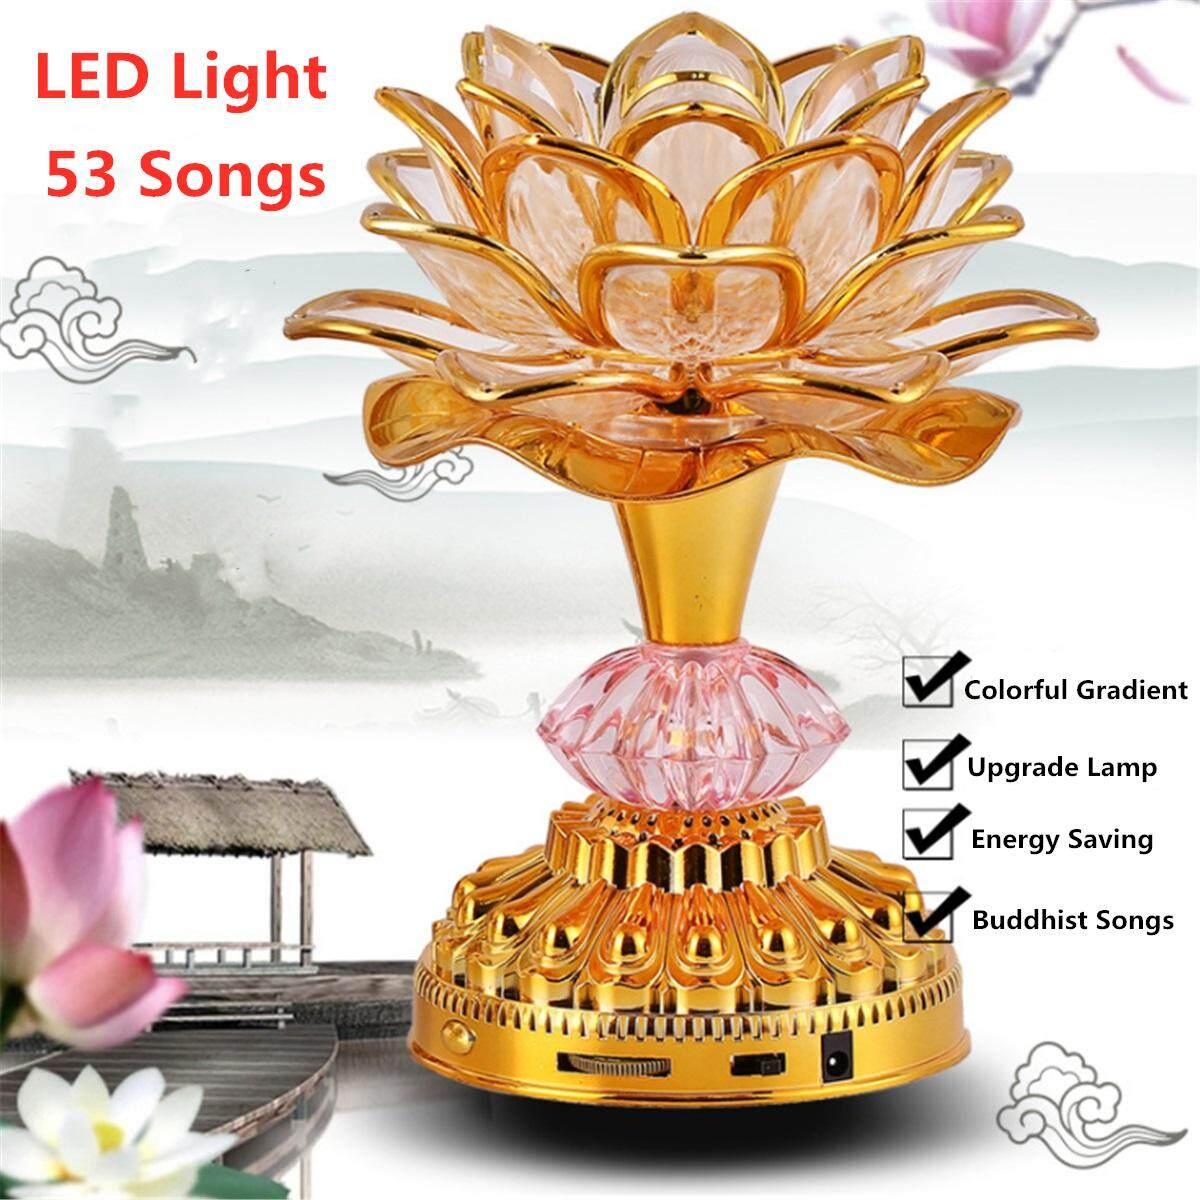 Music Color Changing Lamp Lampe Decoration Farben Led 53 Lied Buddha Musik Song Lotus Machine Deko 7 Buddhism Buddhismus w0OknP